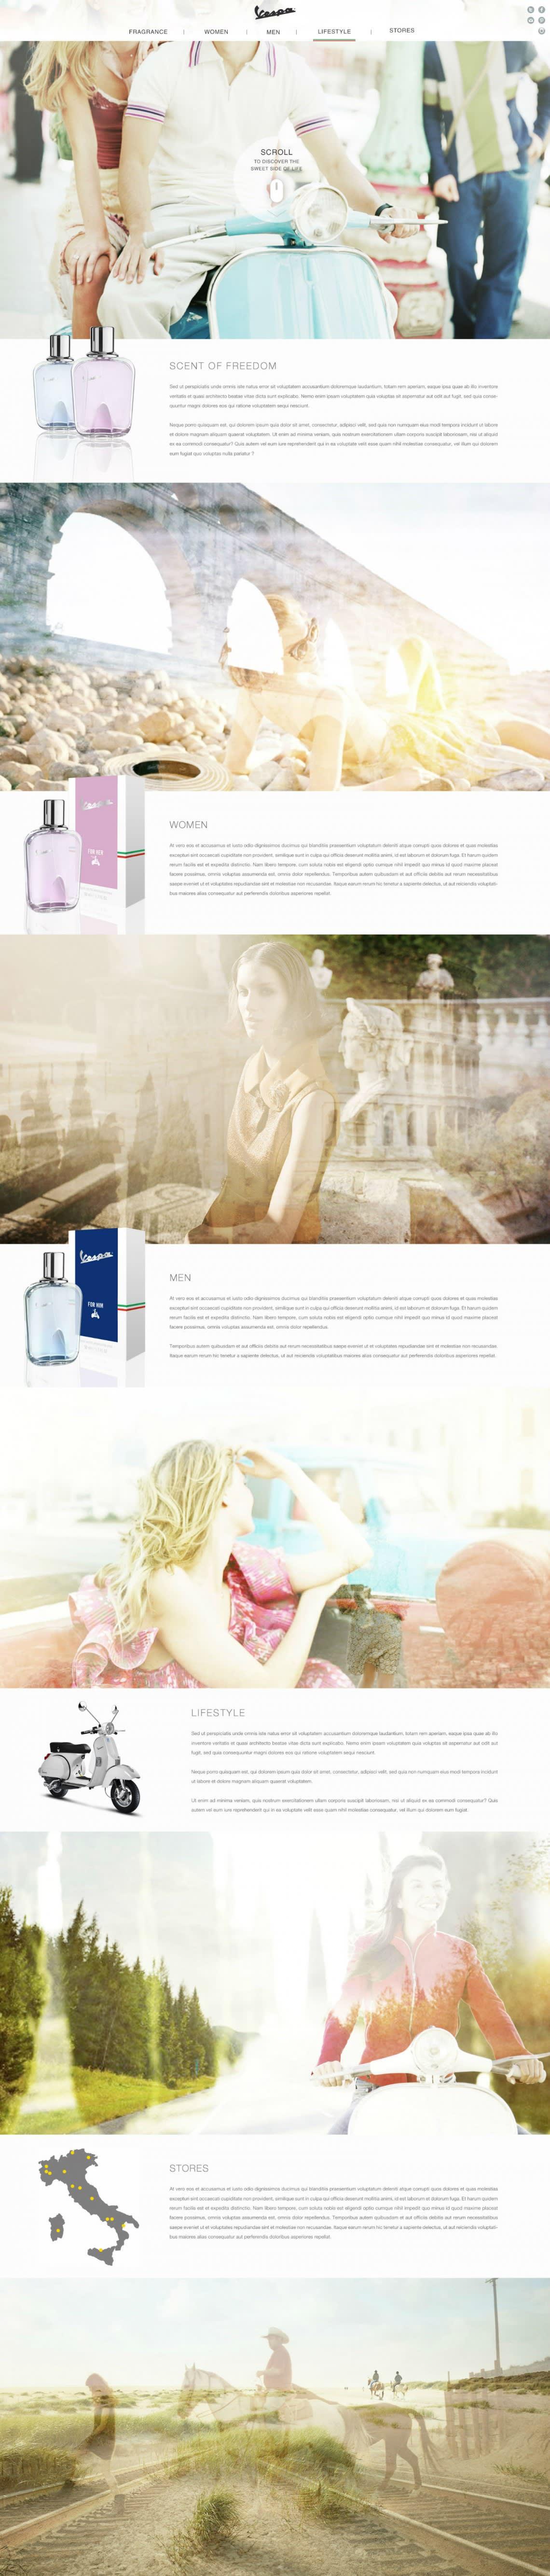 Vespa Fragrance Conception,Stratégie,Direction Artistique,Webdesign